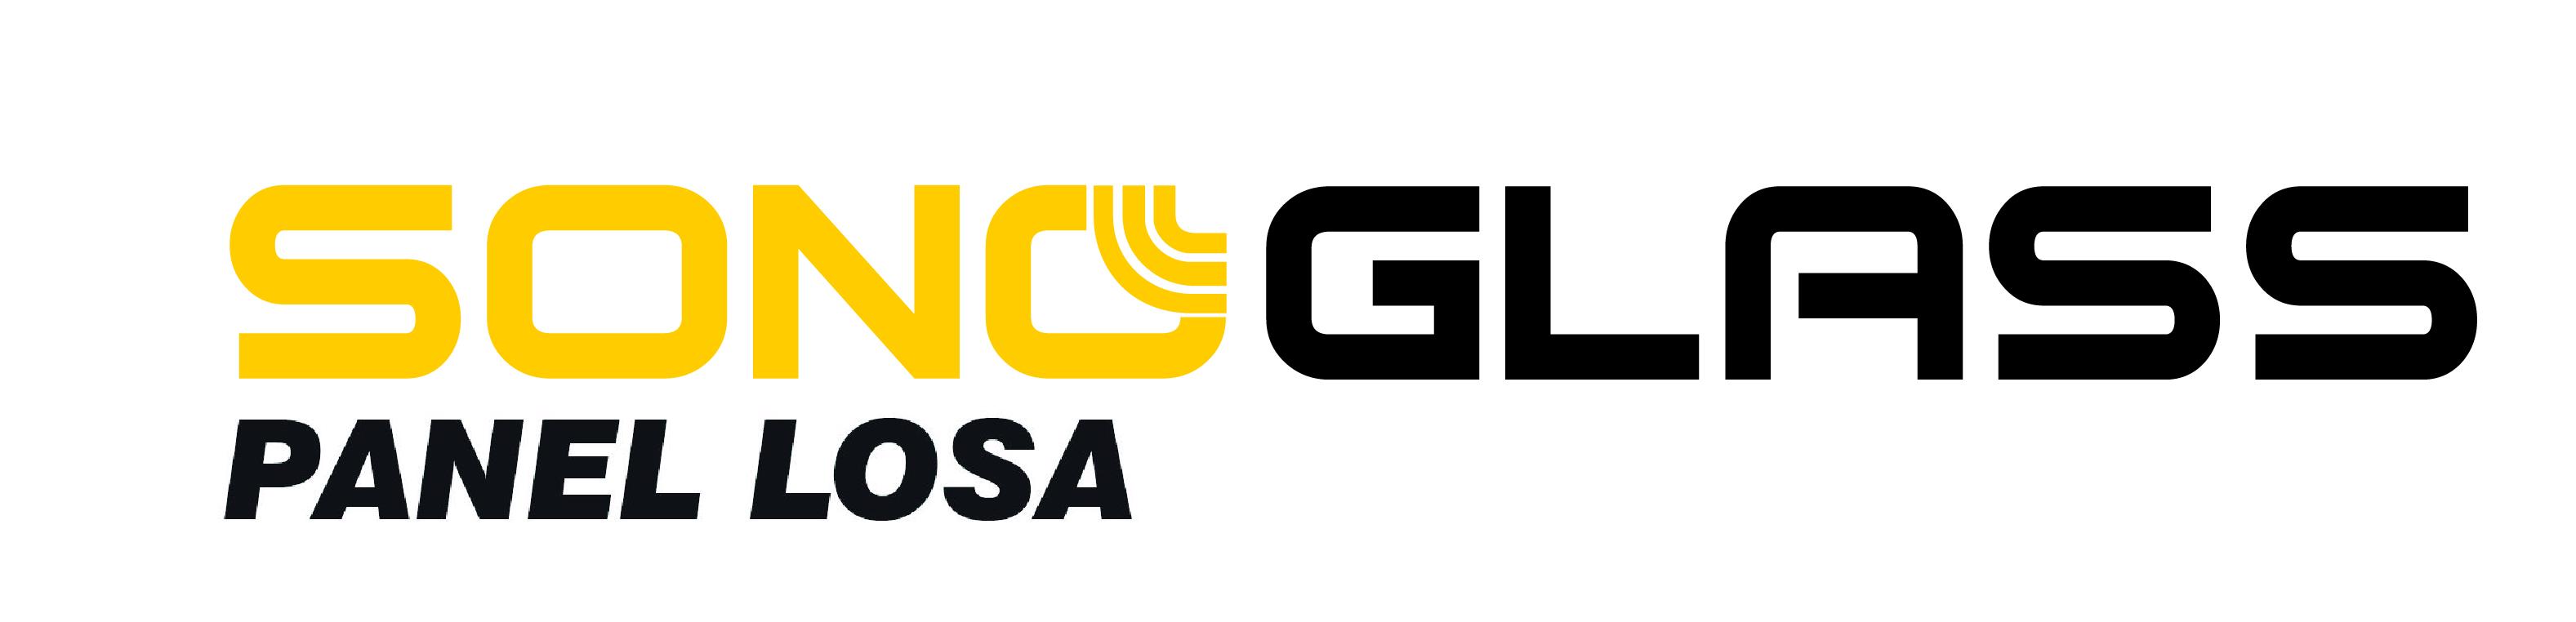 logotipo panel acustico sonoglass panel losa